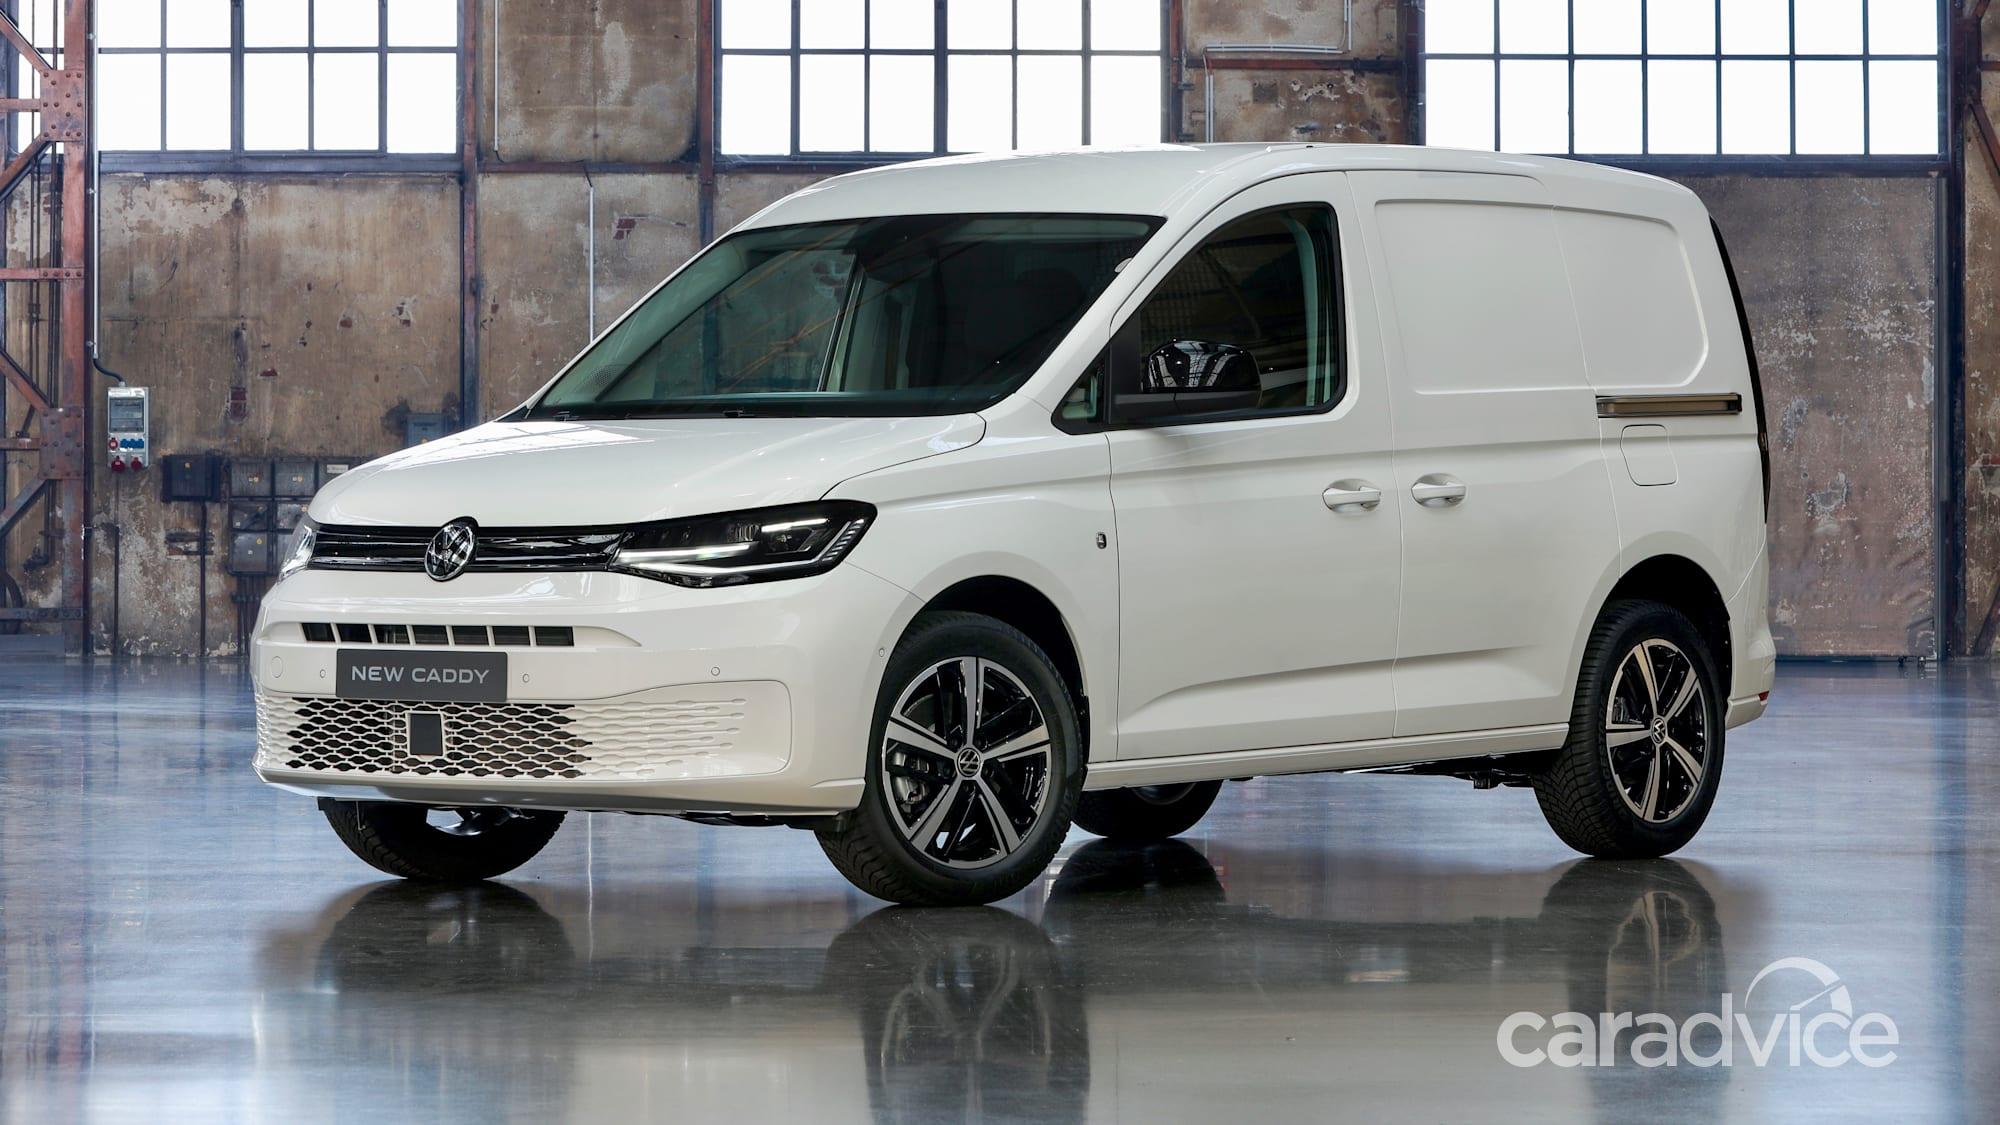 2021 volkswagen caddy and california due in australia next